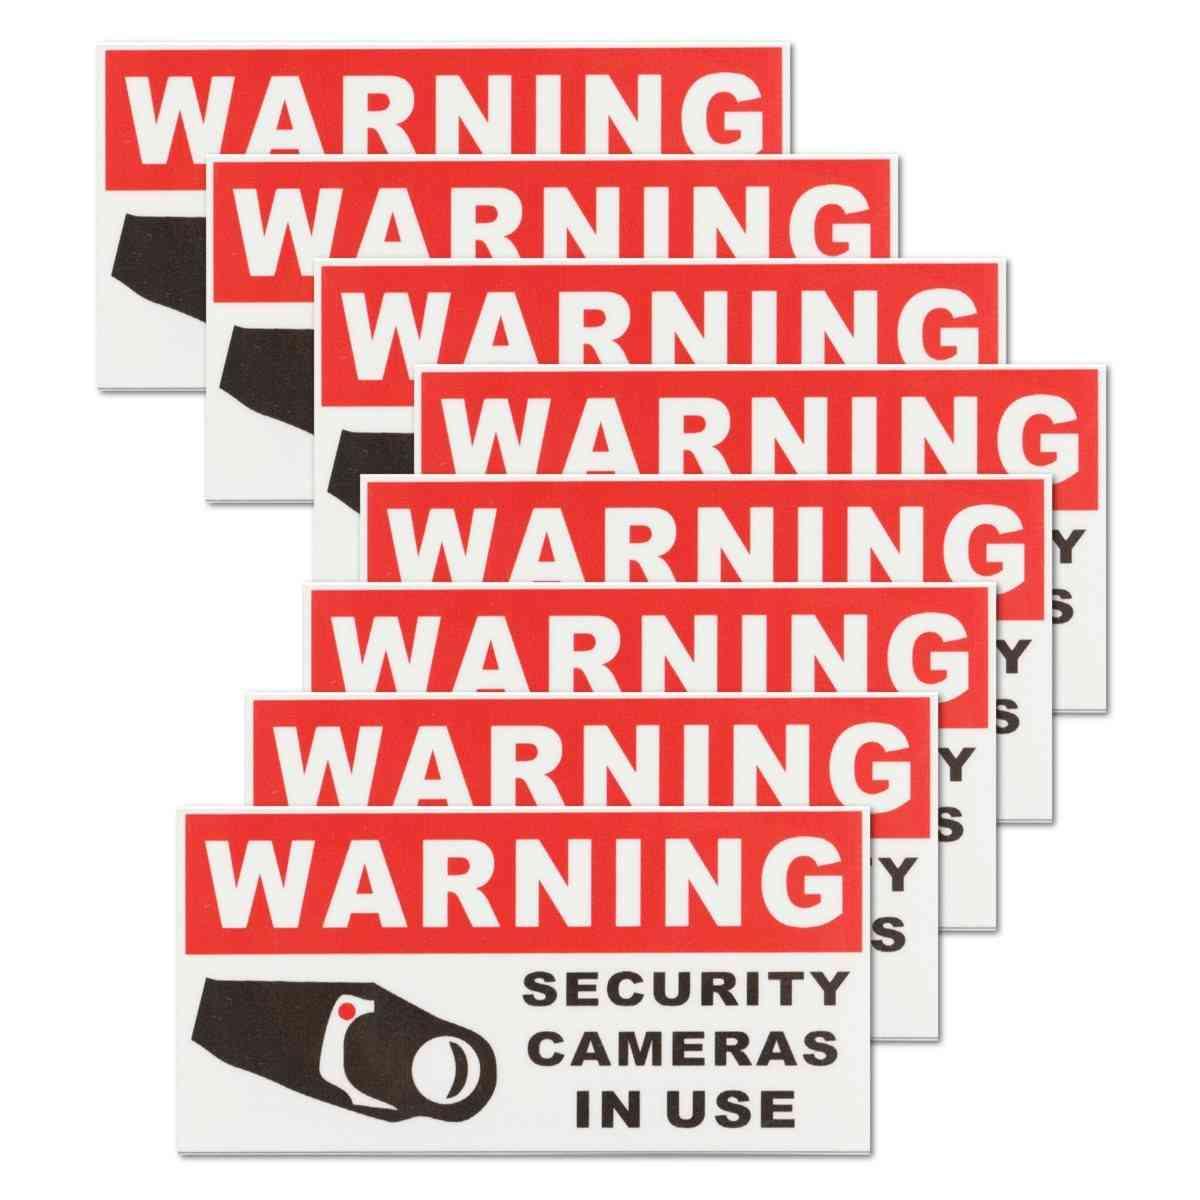 Security Camera In Use Waterproof Self-adhesive Warning Stickers